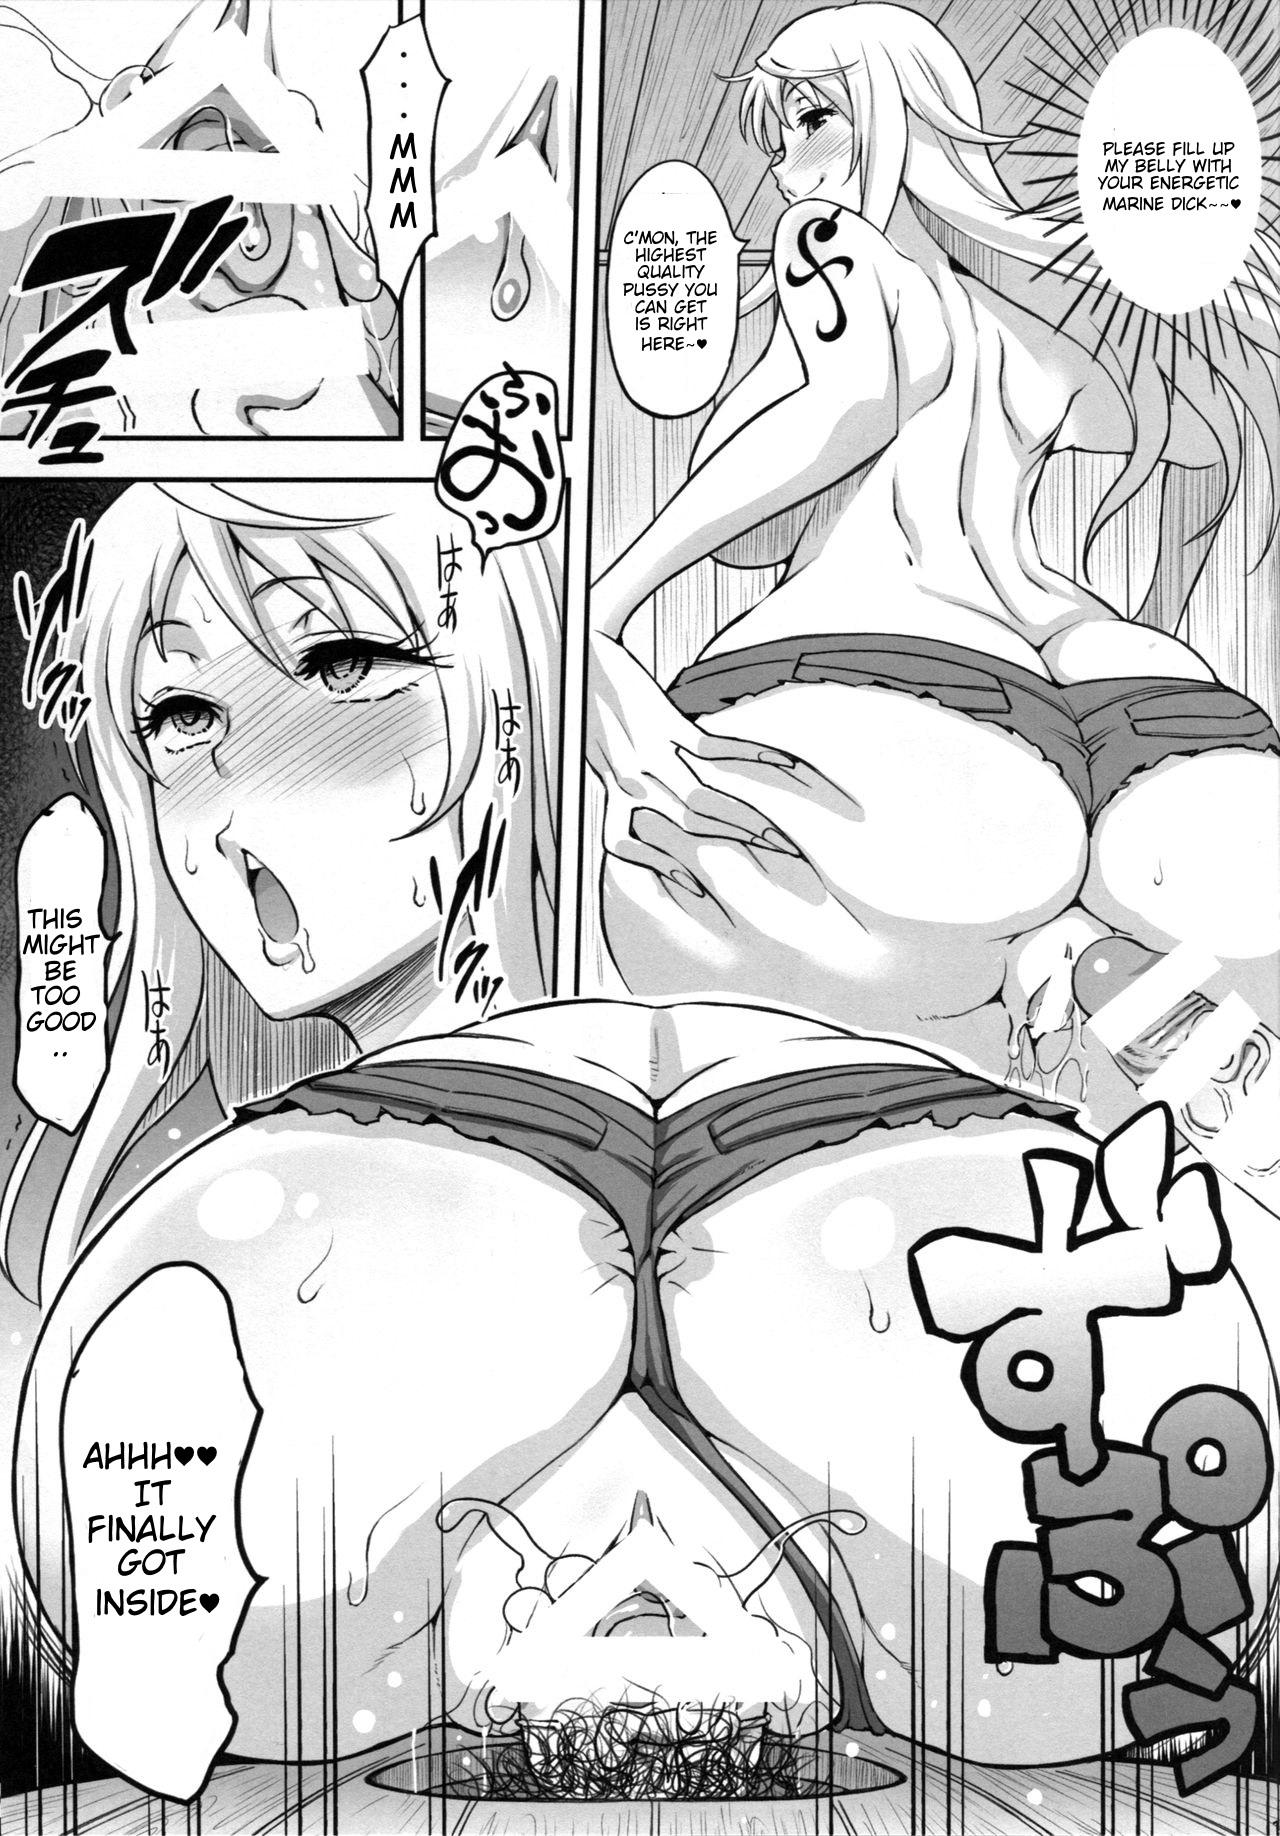 Rakuen Onna Kaizoku 5 - Women Pirate in Paradise 14